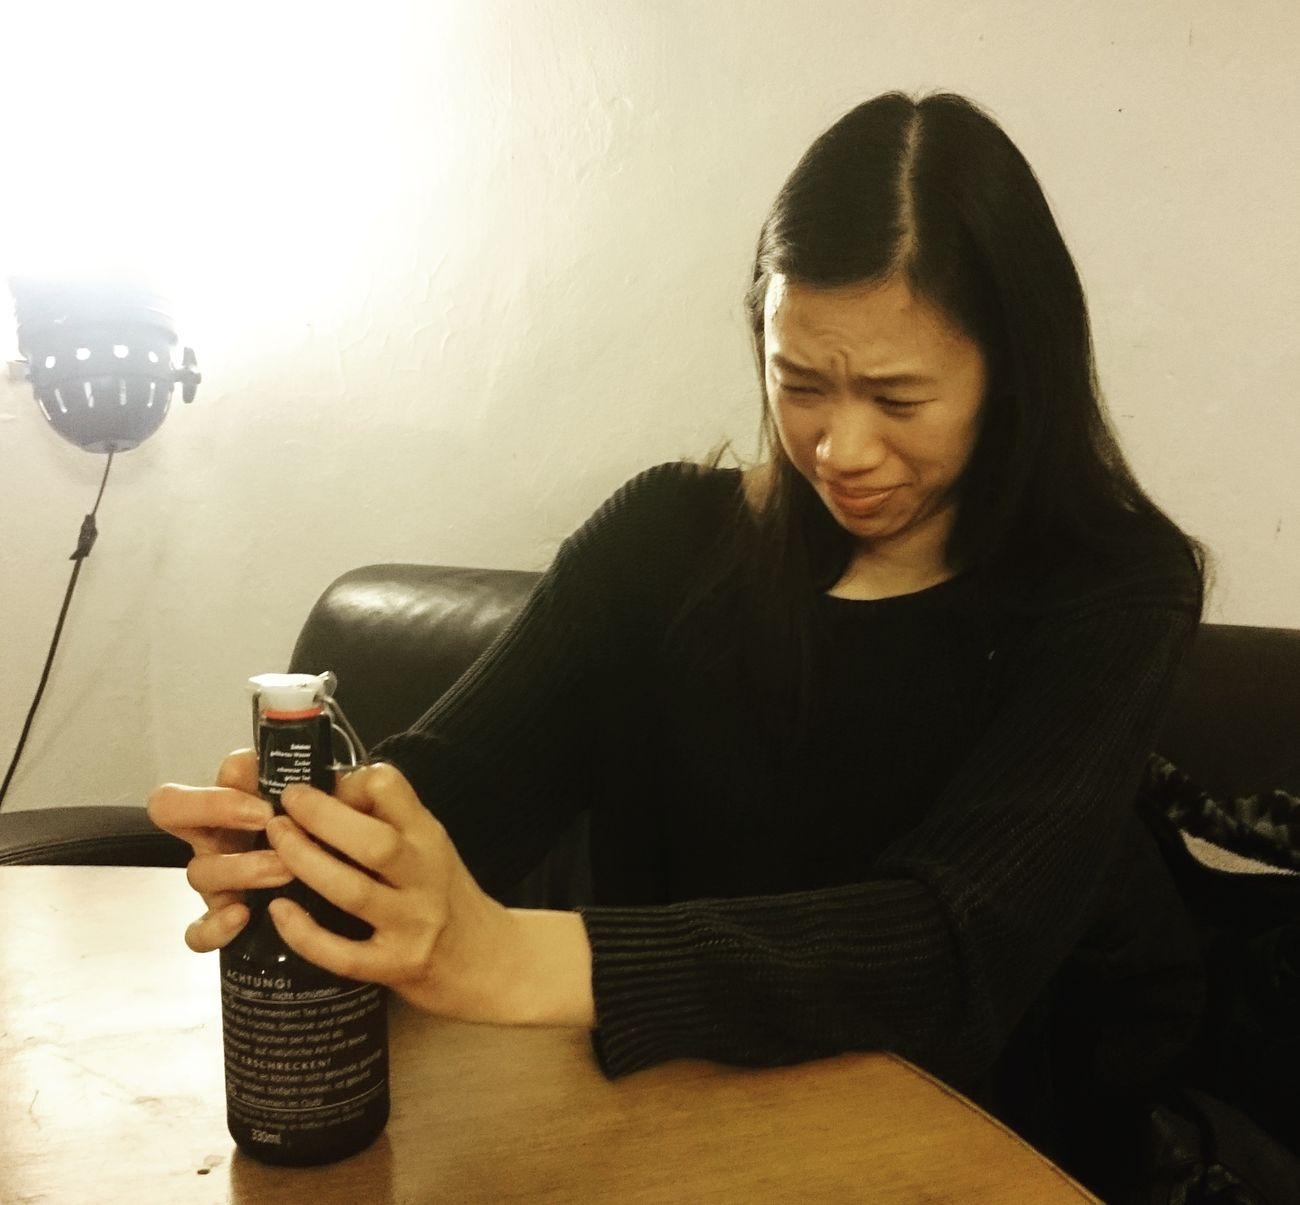 Pop Kombucha Drink Single Woman